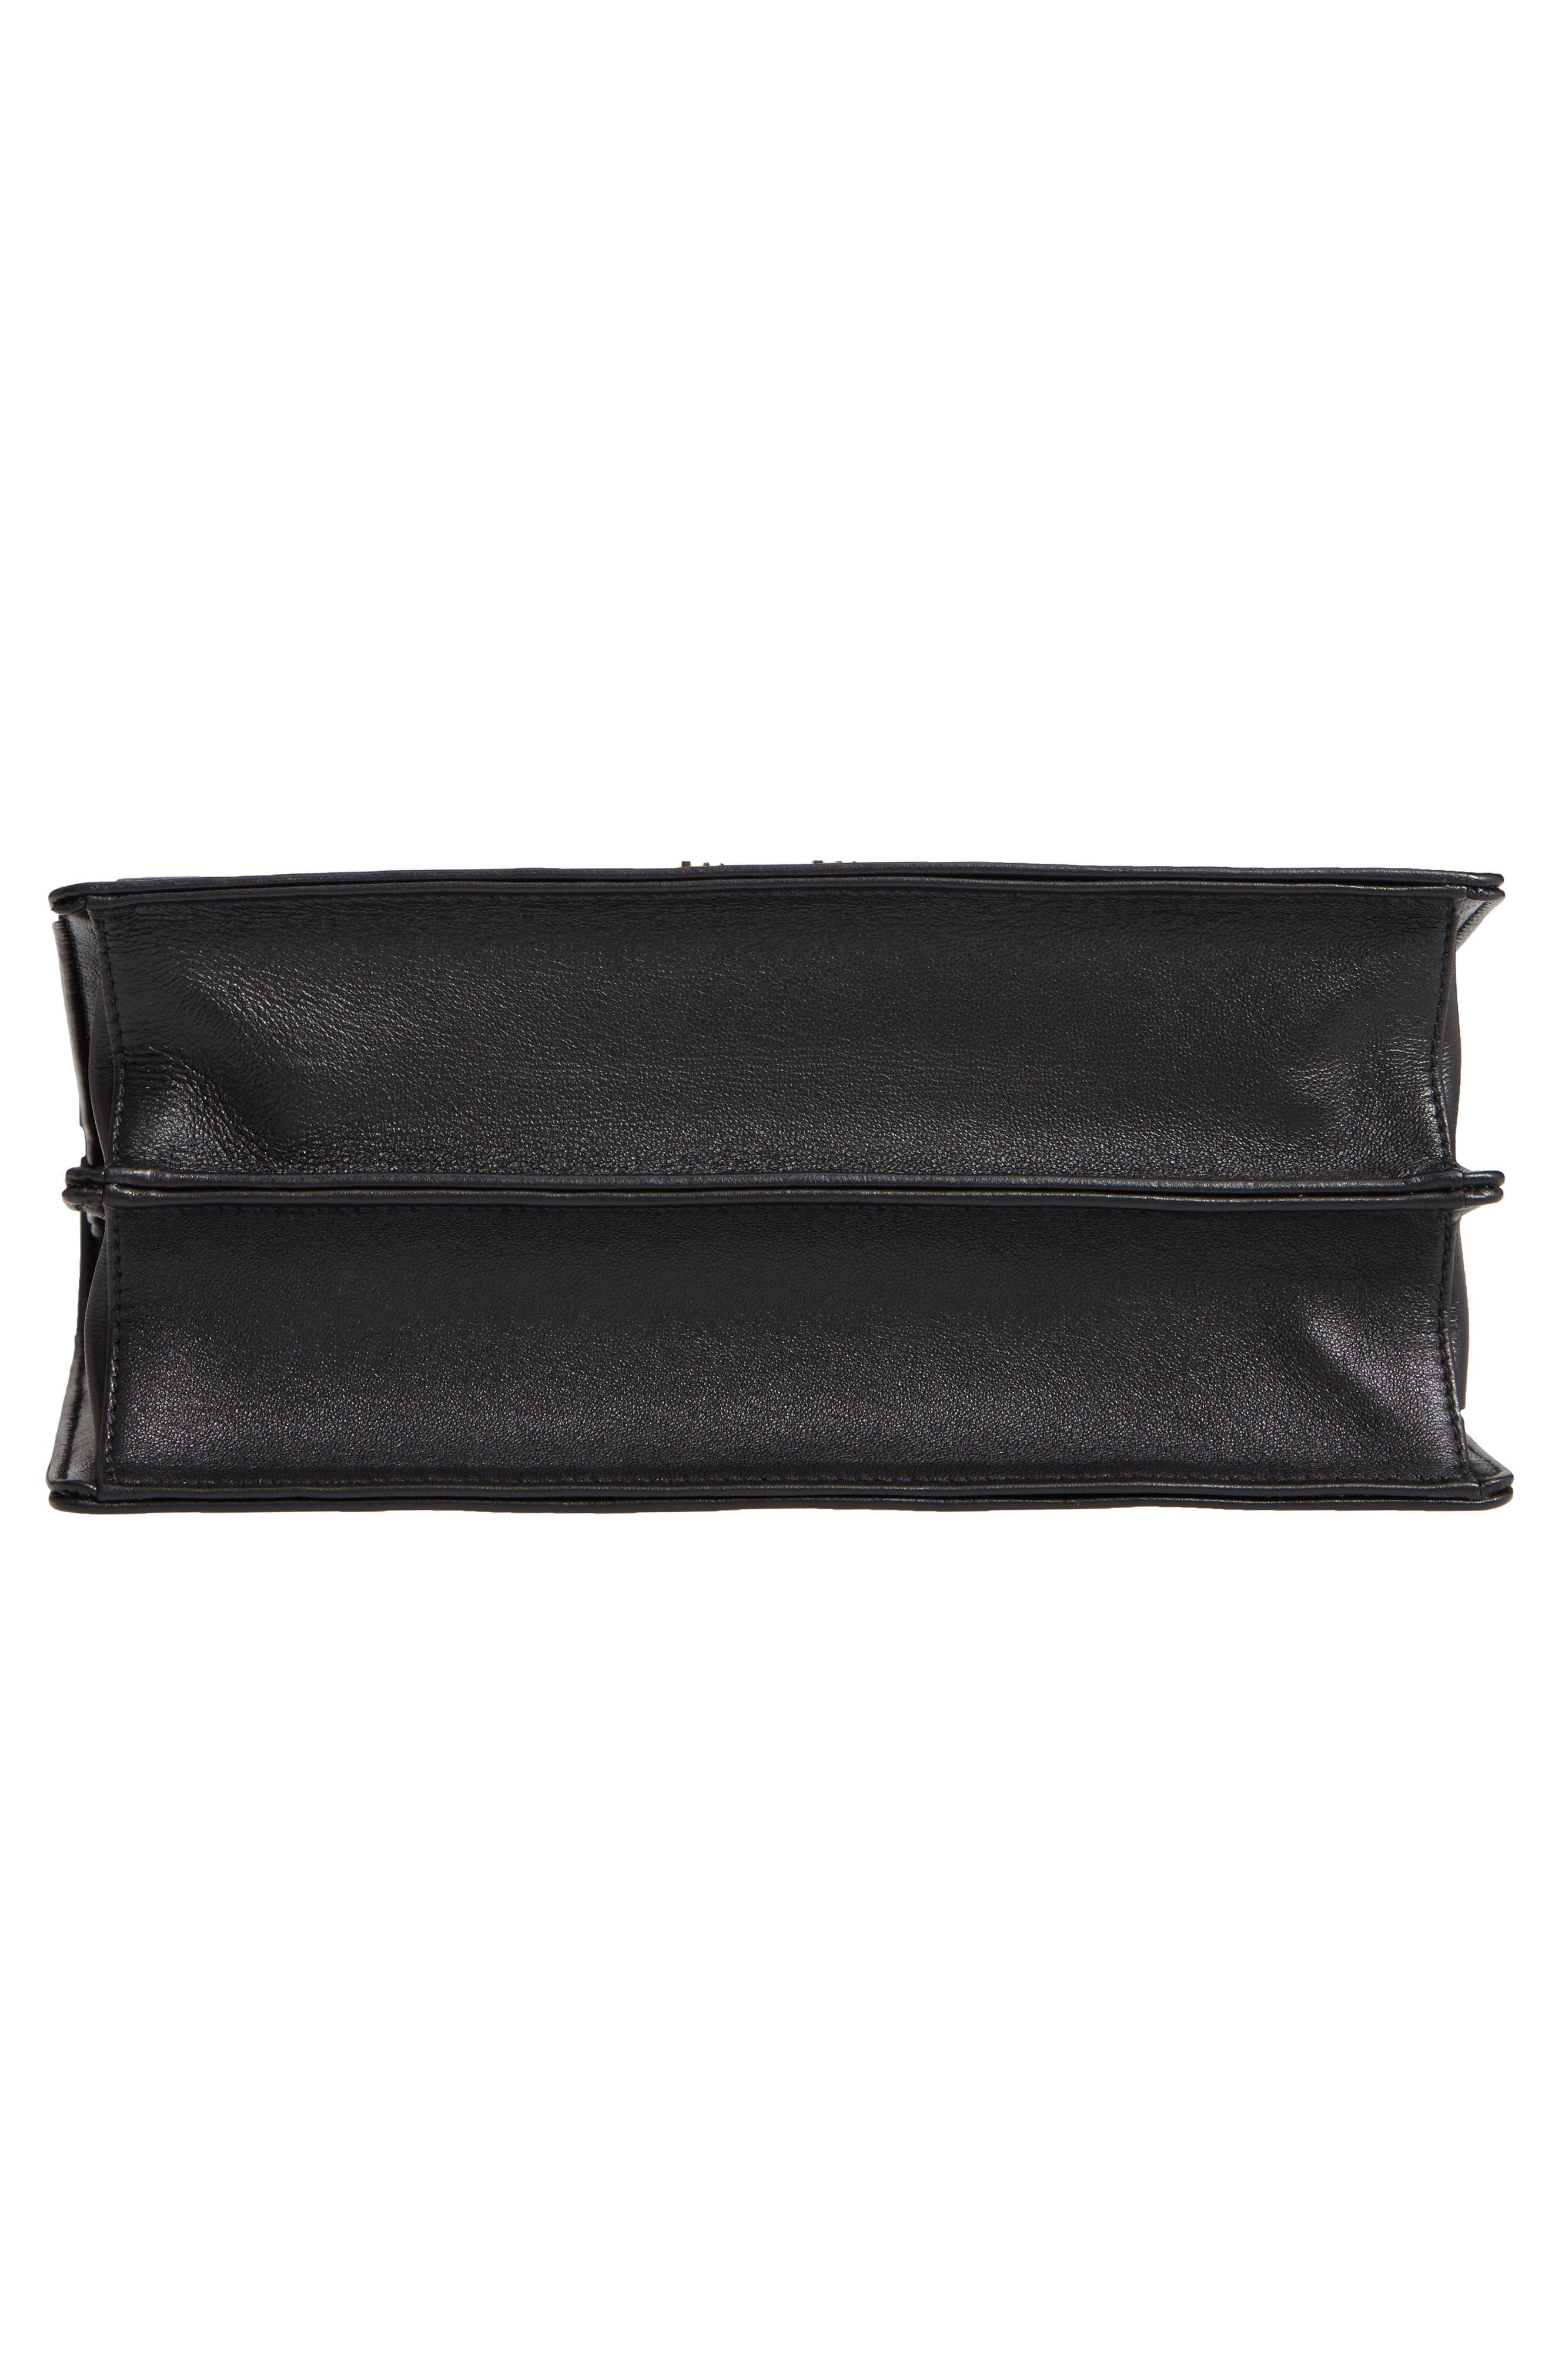 Confidential Matelassé Quilted Lambskin Leather Top Handle Bag,                             Alternate thumbnail 6, color,                             NERO